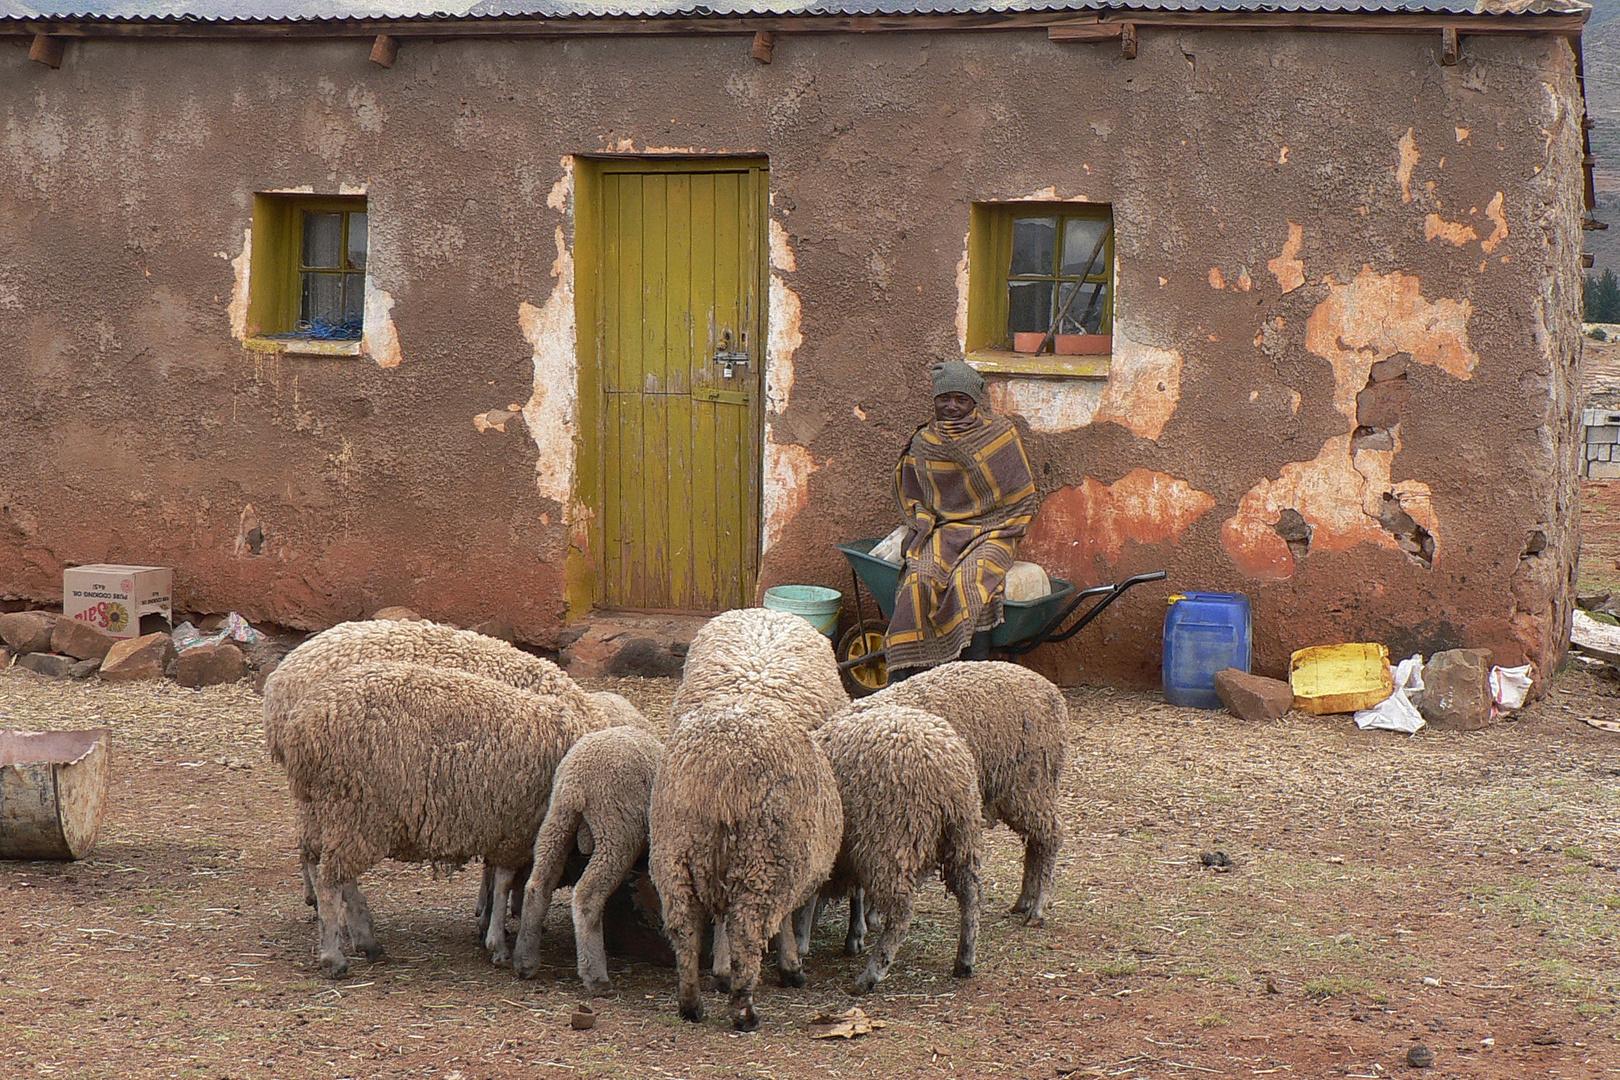 Im afrikanischen Zwergstaat Lesotho